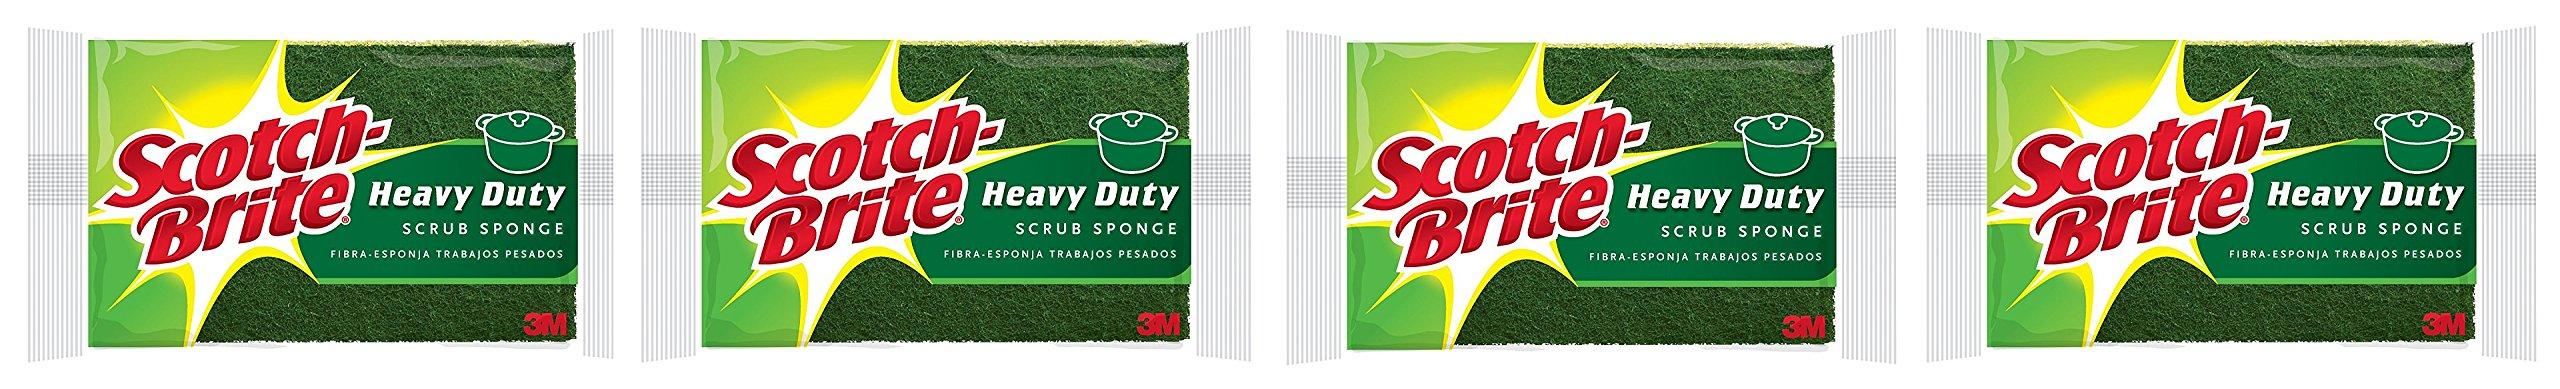 Scotch-Brite Heavy Duty Scrub Sponge REBKHf, 4 Count